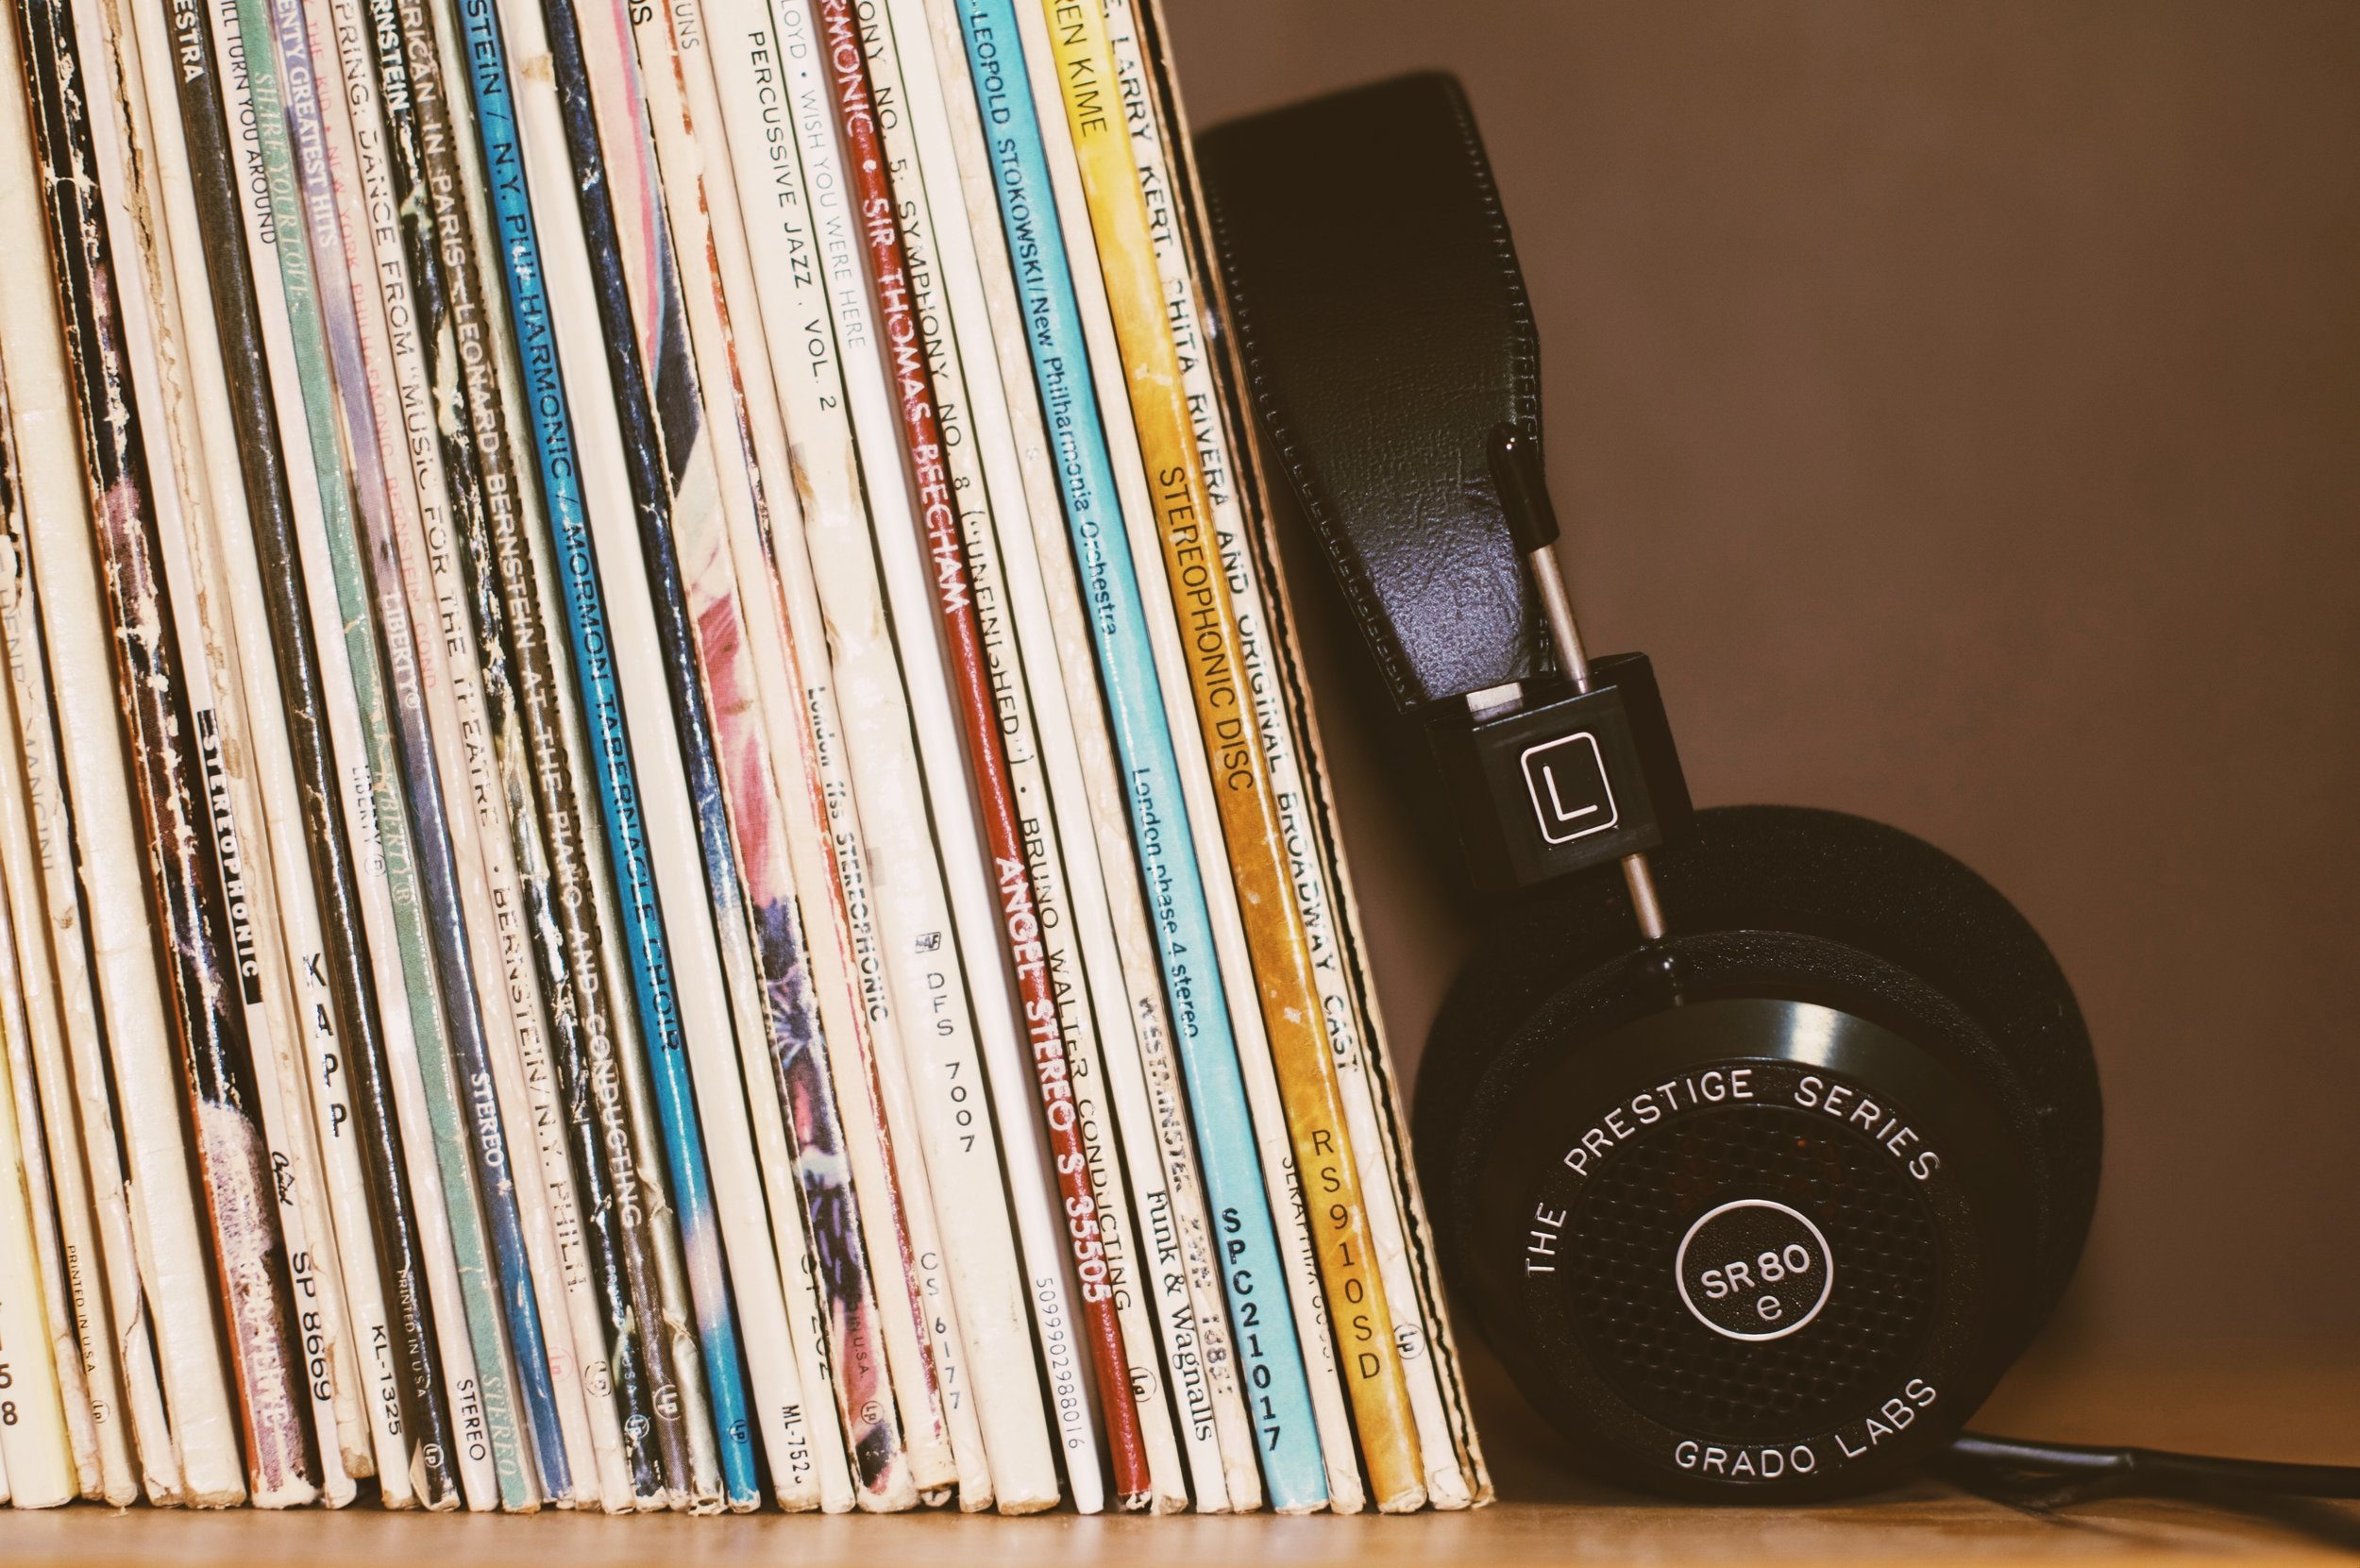 record-vinyl-library-headphones-shelf-mark-solarski-183866-unsplash.jpg